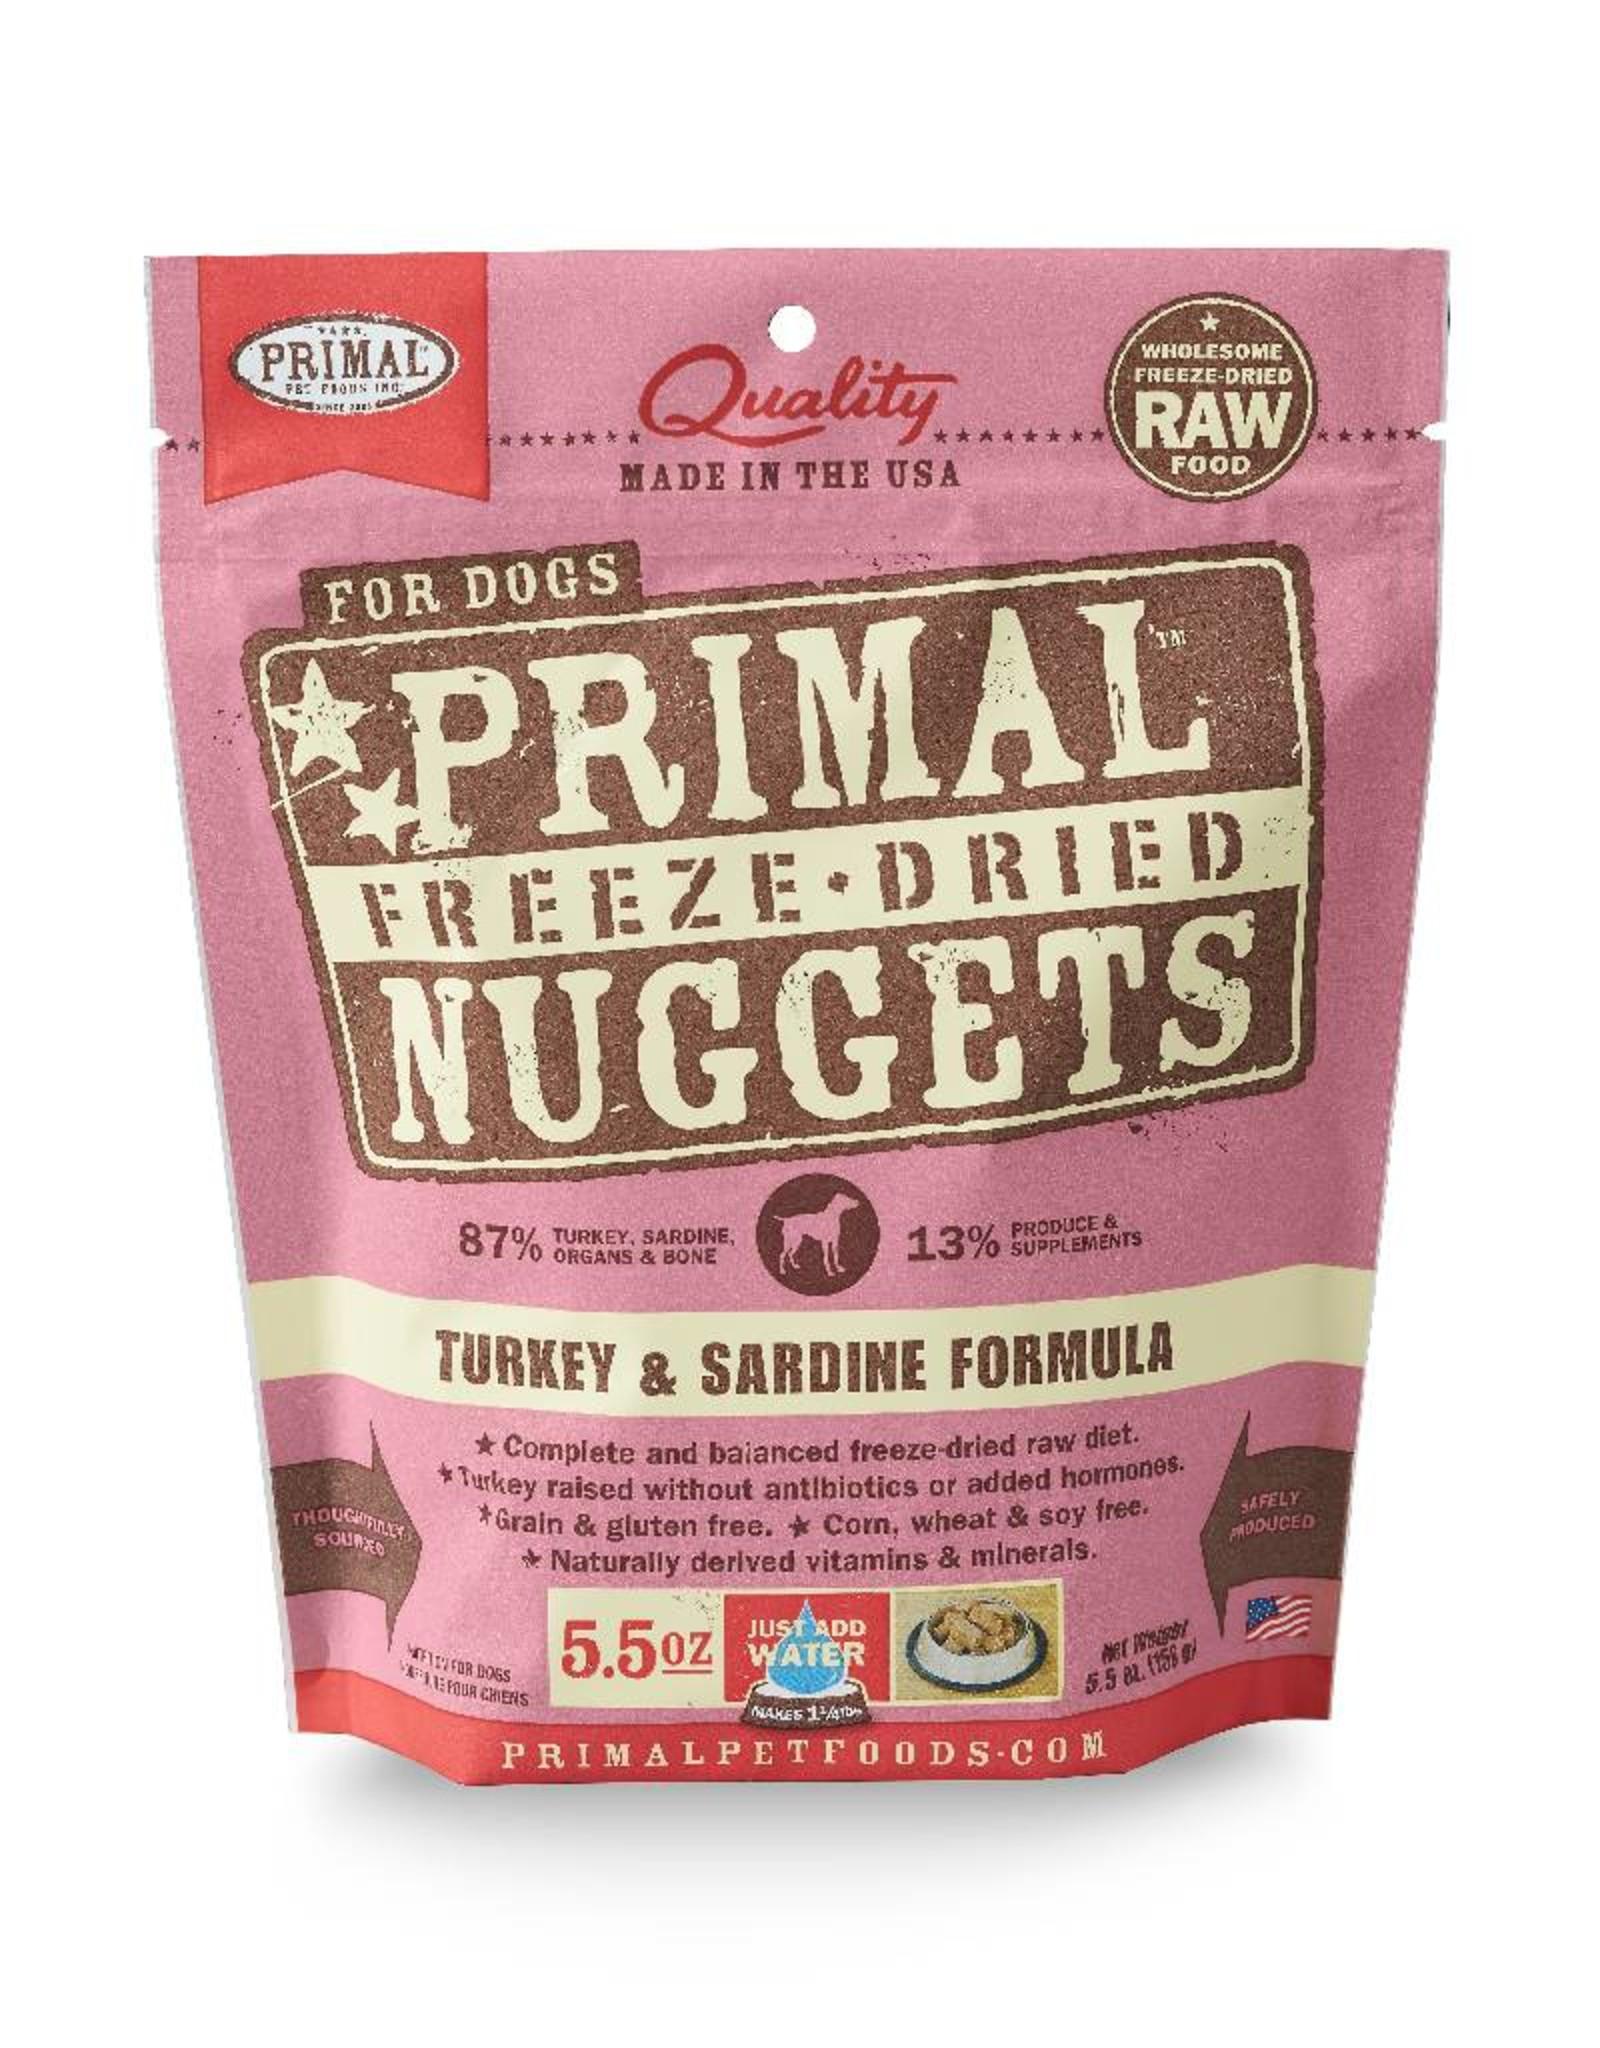 PRIMAL PET FOODS Primal | Freeze Dried Nuggets Canine Turkey & Sardine Formula